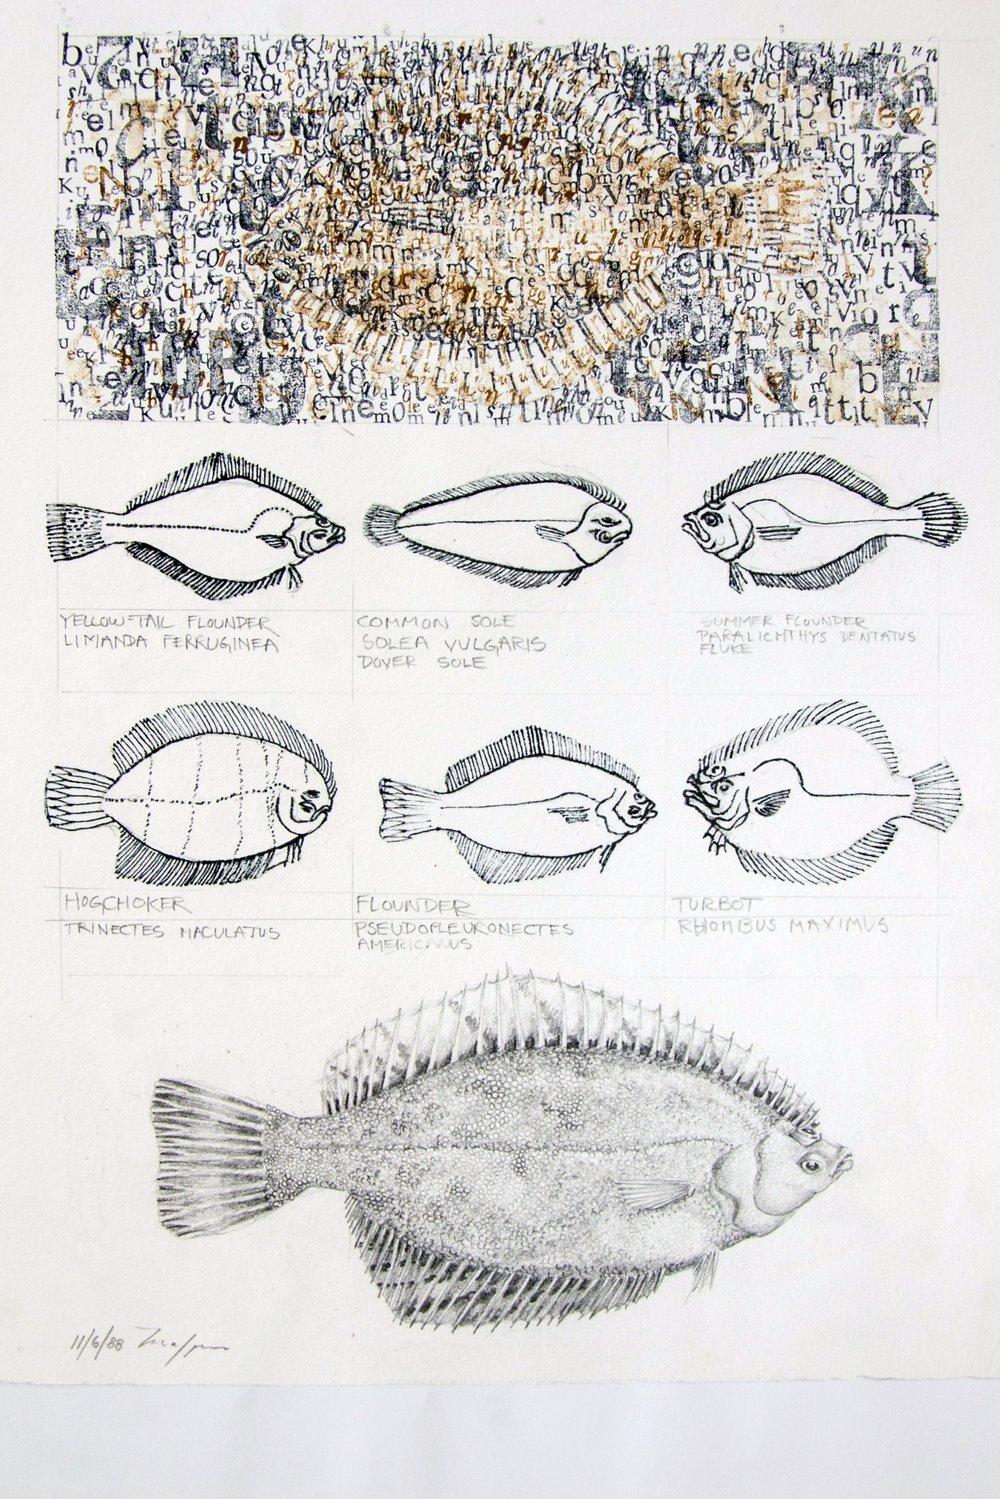 Flounder Flurry